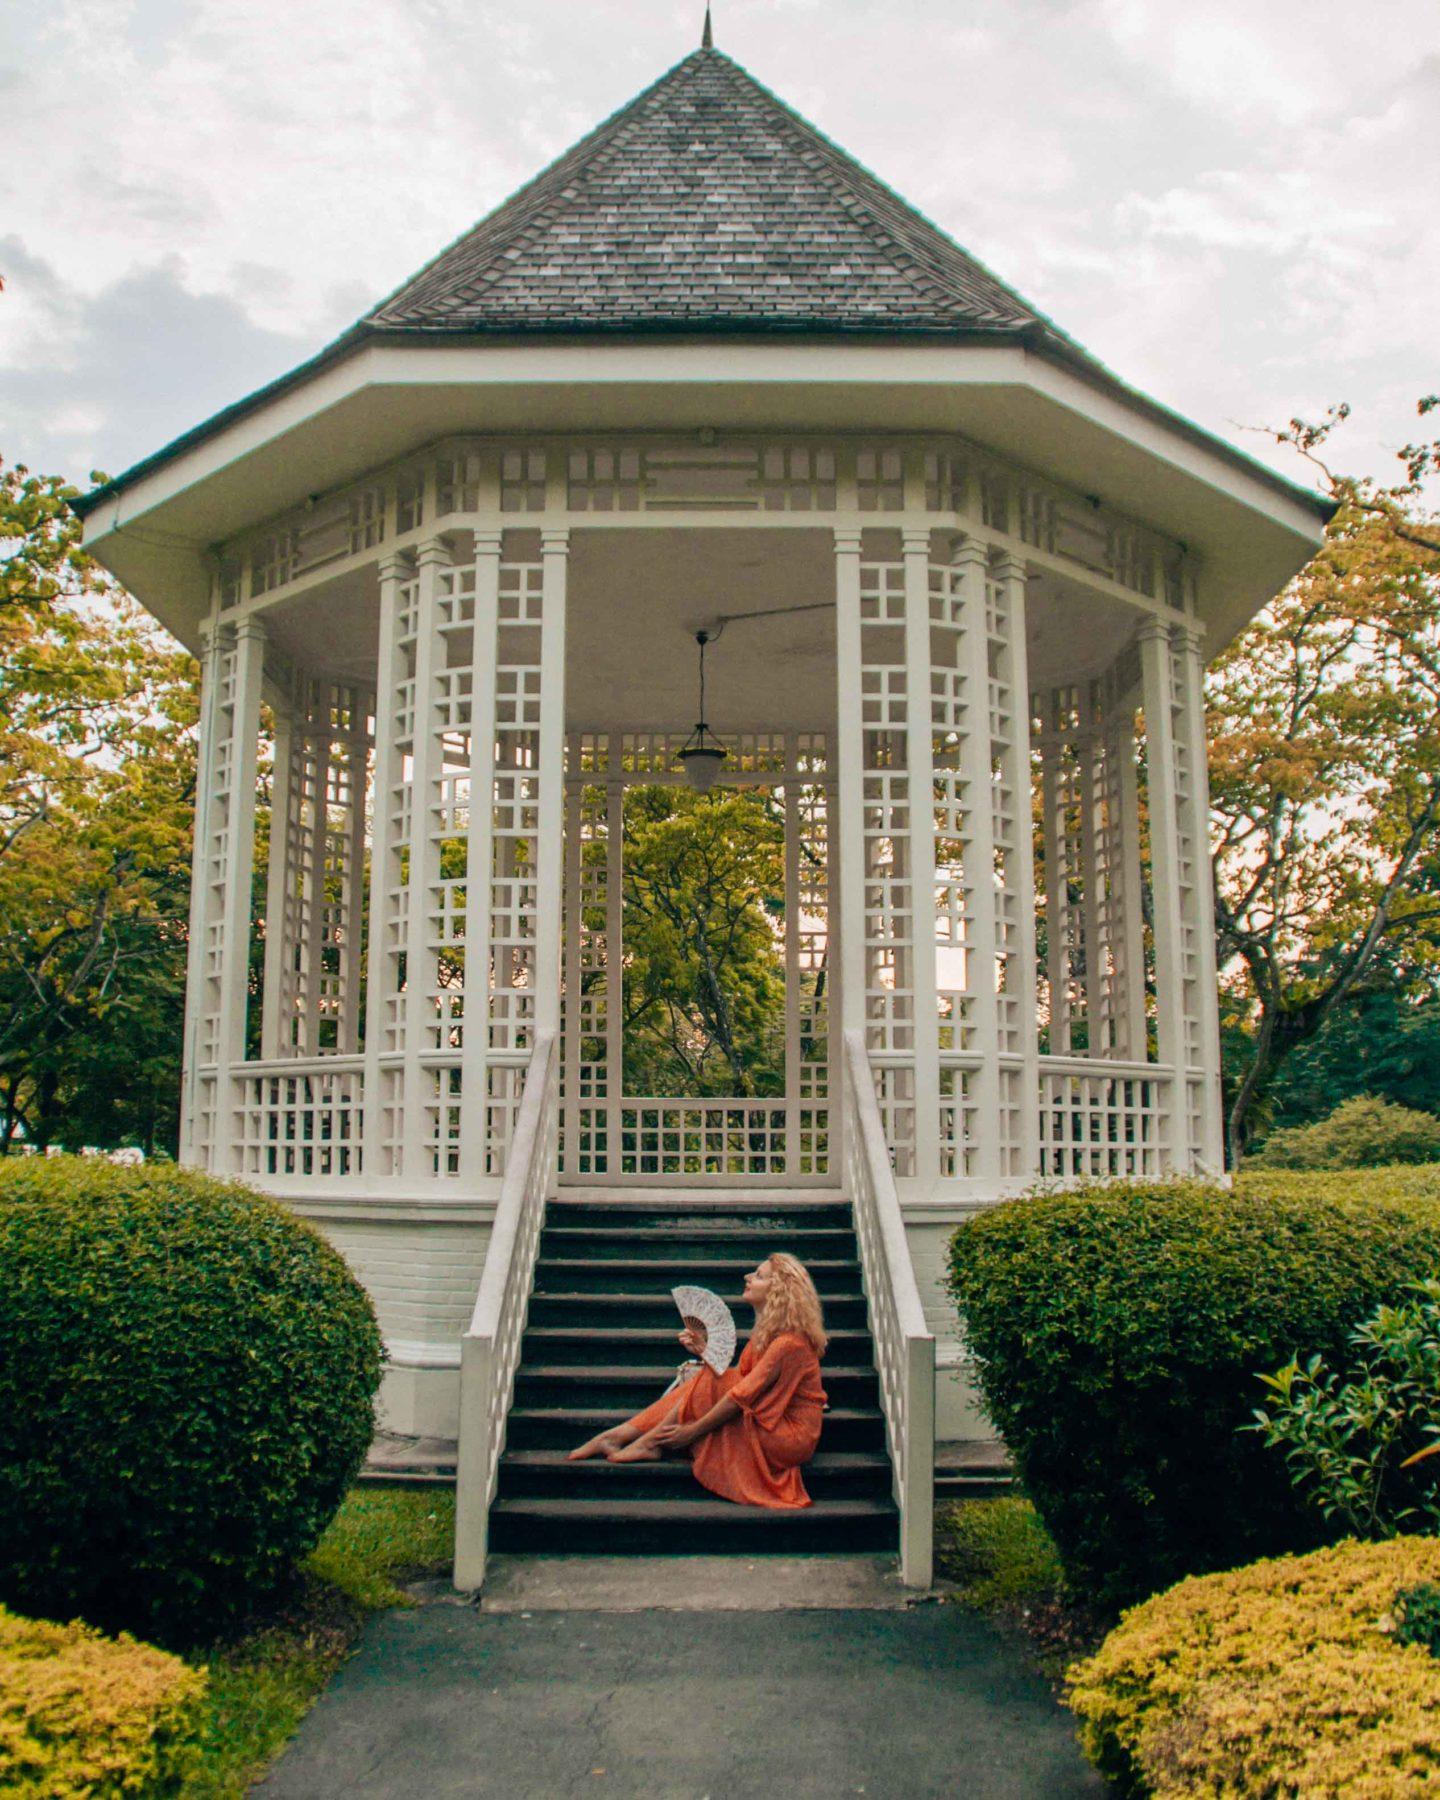 Botanic Gardens bandstand, Singapore